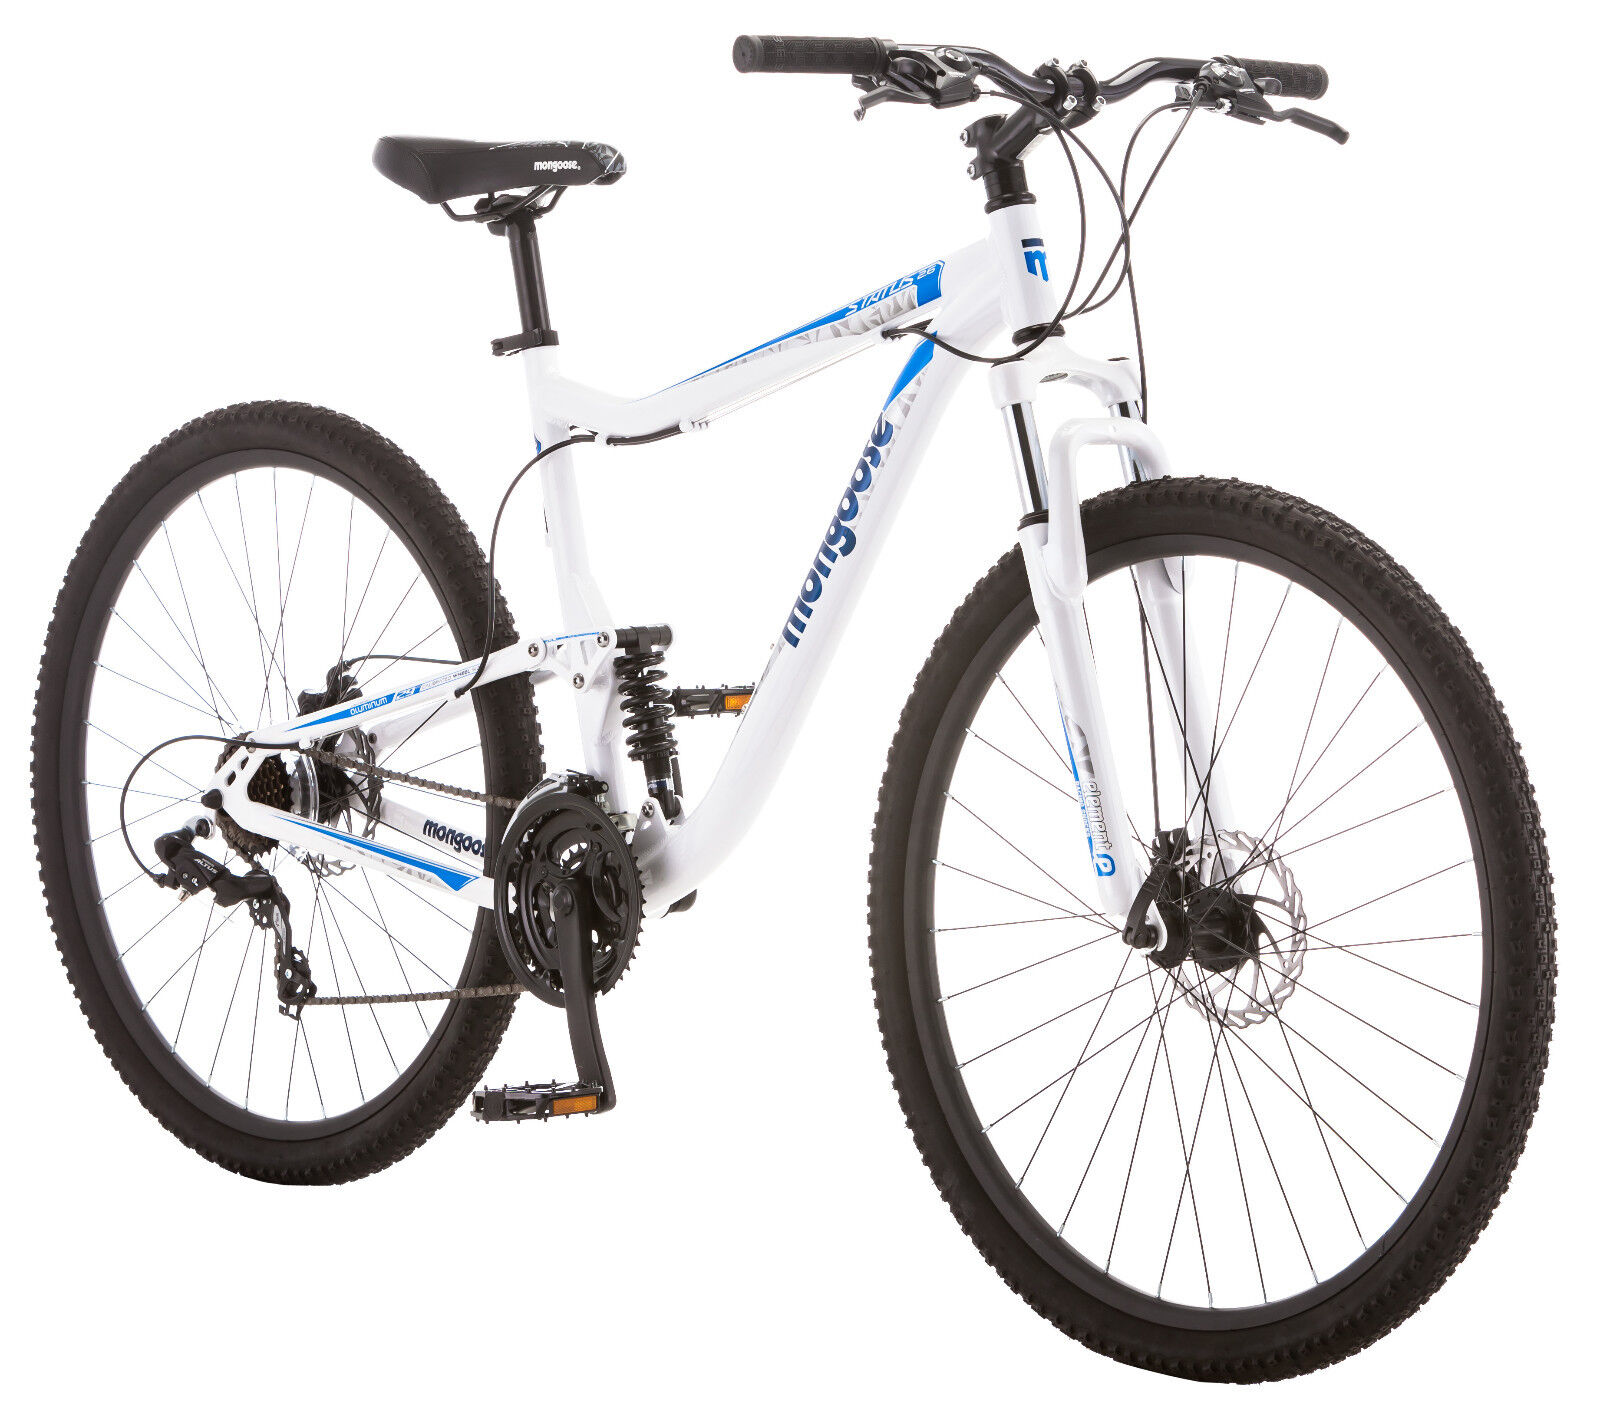 mongoose mountain bike reviews - HD1024×1024